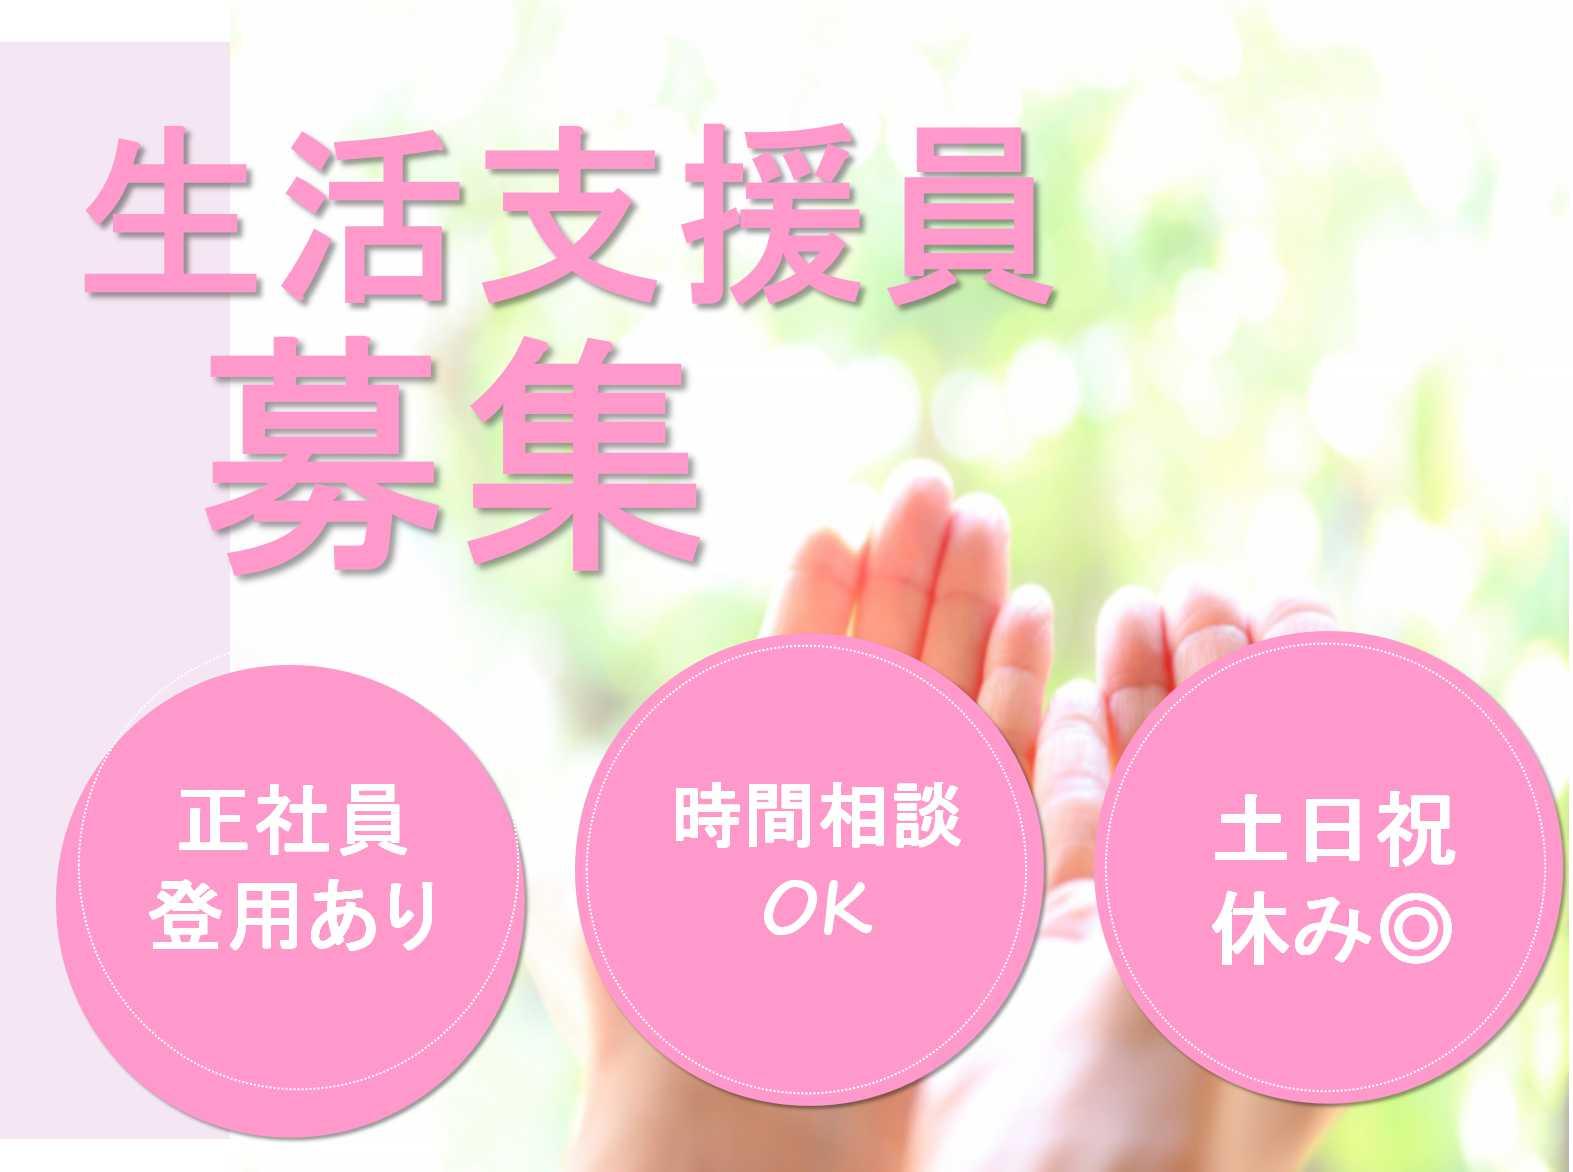 土日祝日休み 未経験OK!生活支援員募集【即面談可能】 イメージ